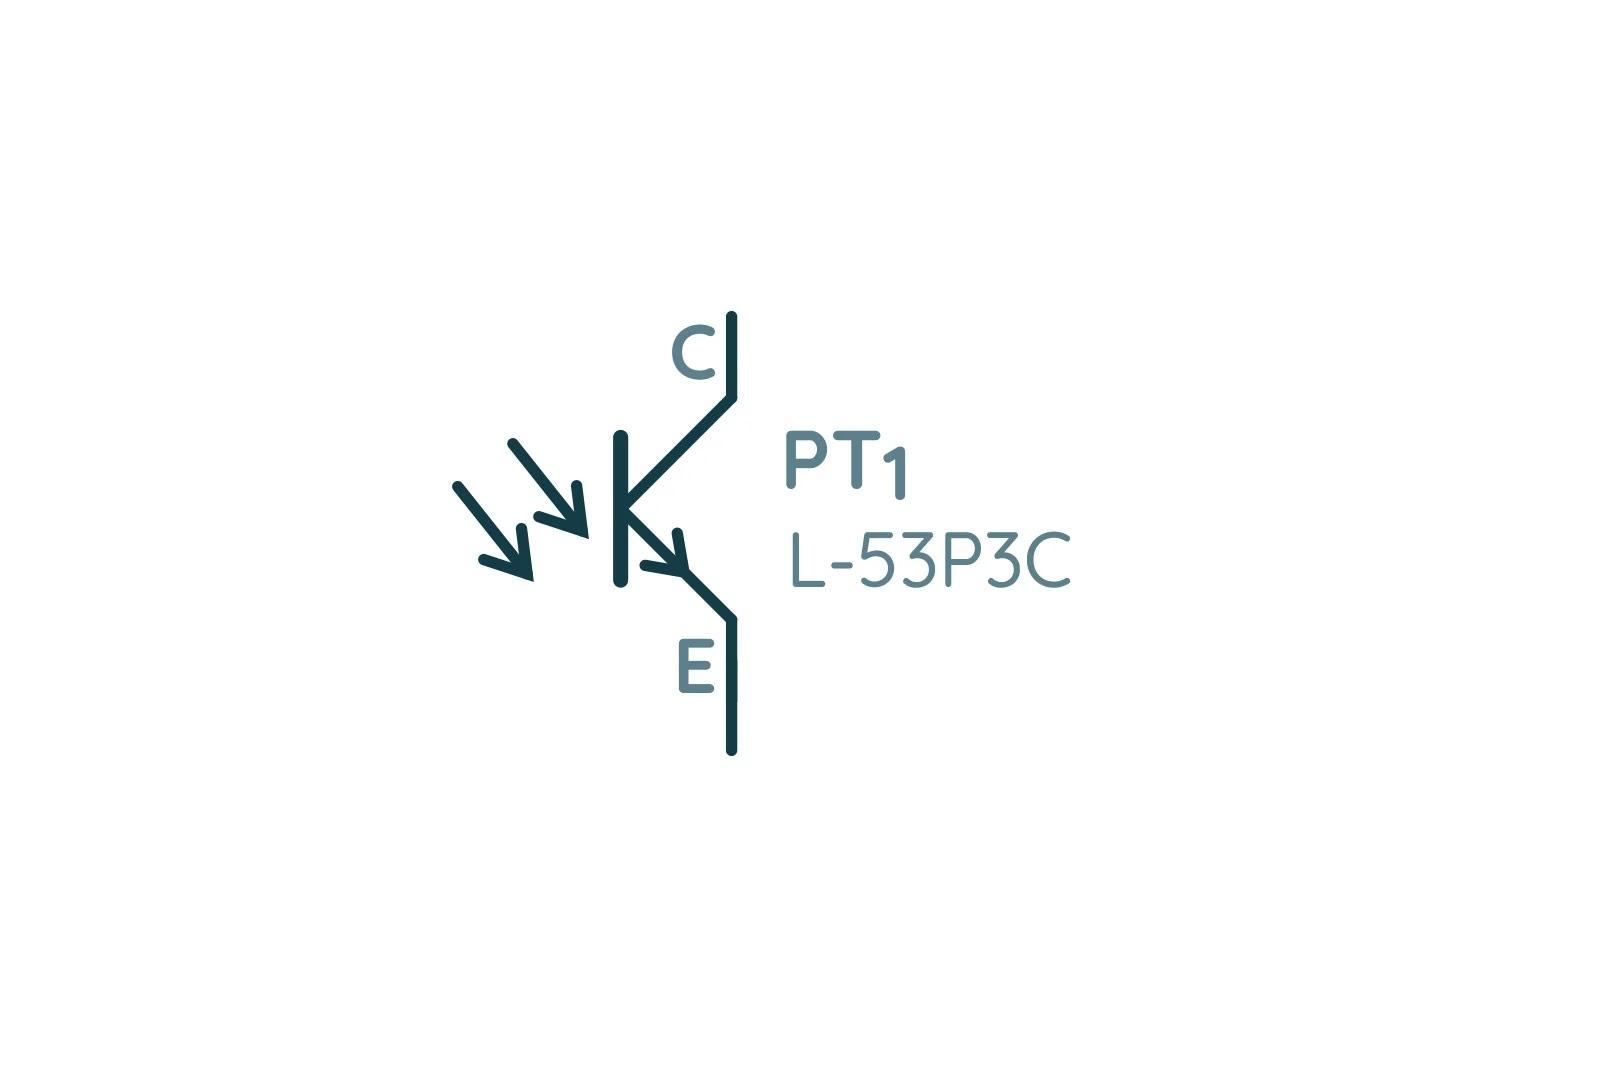 Обозначение фототранзистора